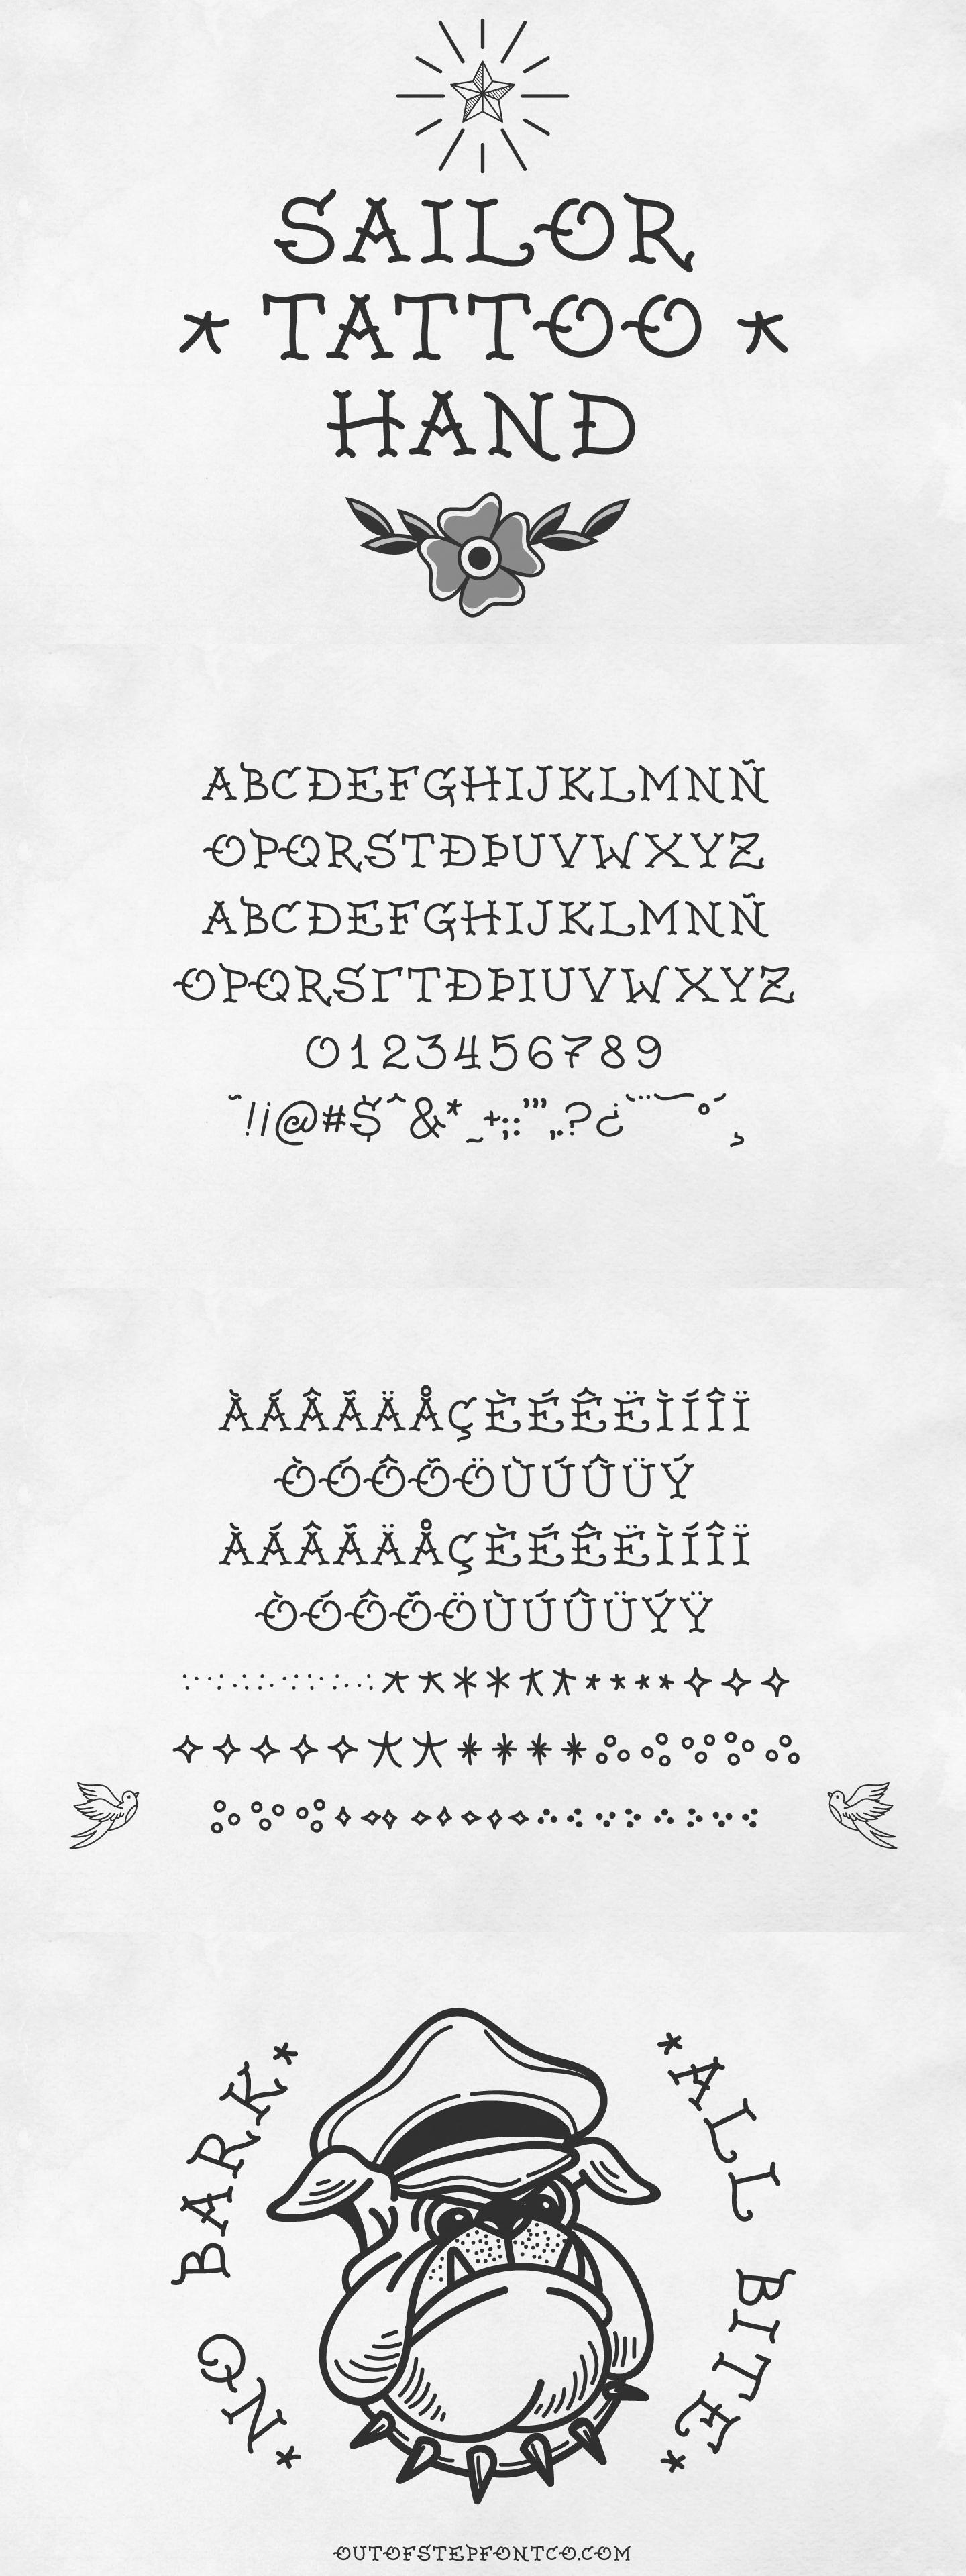 Traditional Tattoo Text : traditional, tattoo, Sailor, Tattoo, Brand, School, Traditional, Fonts